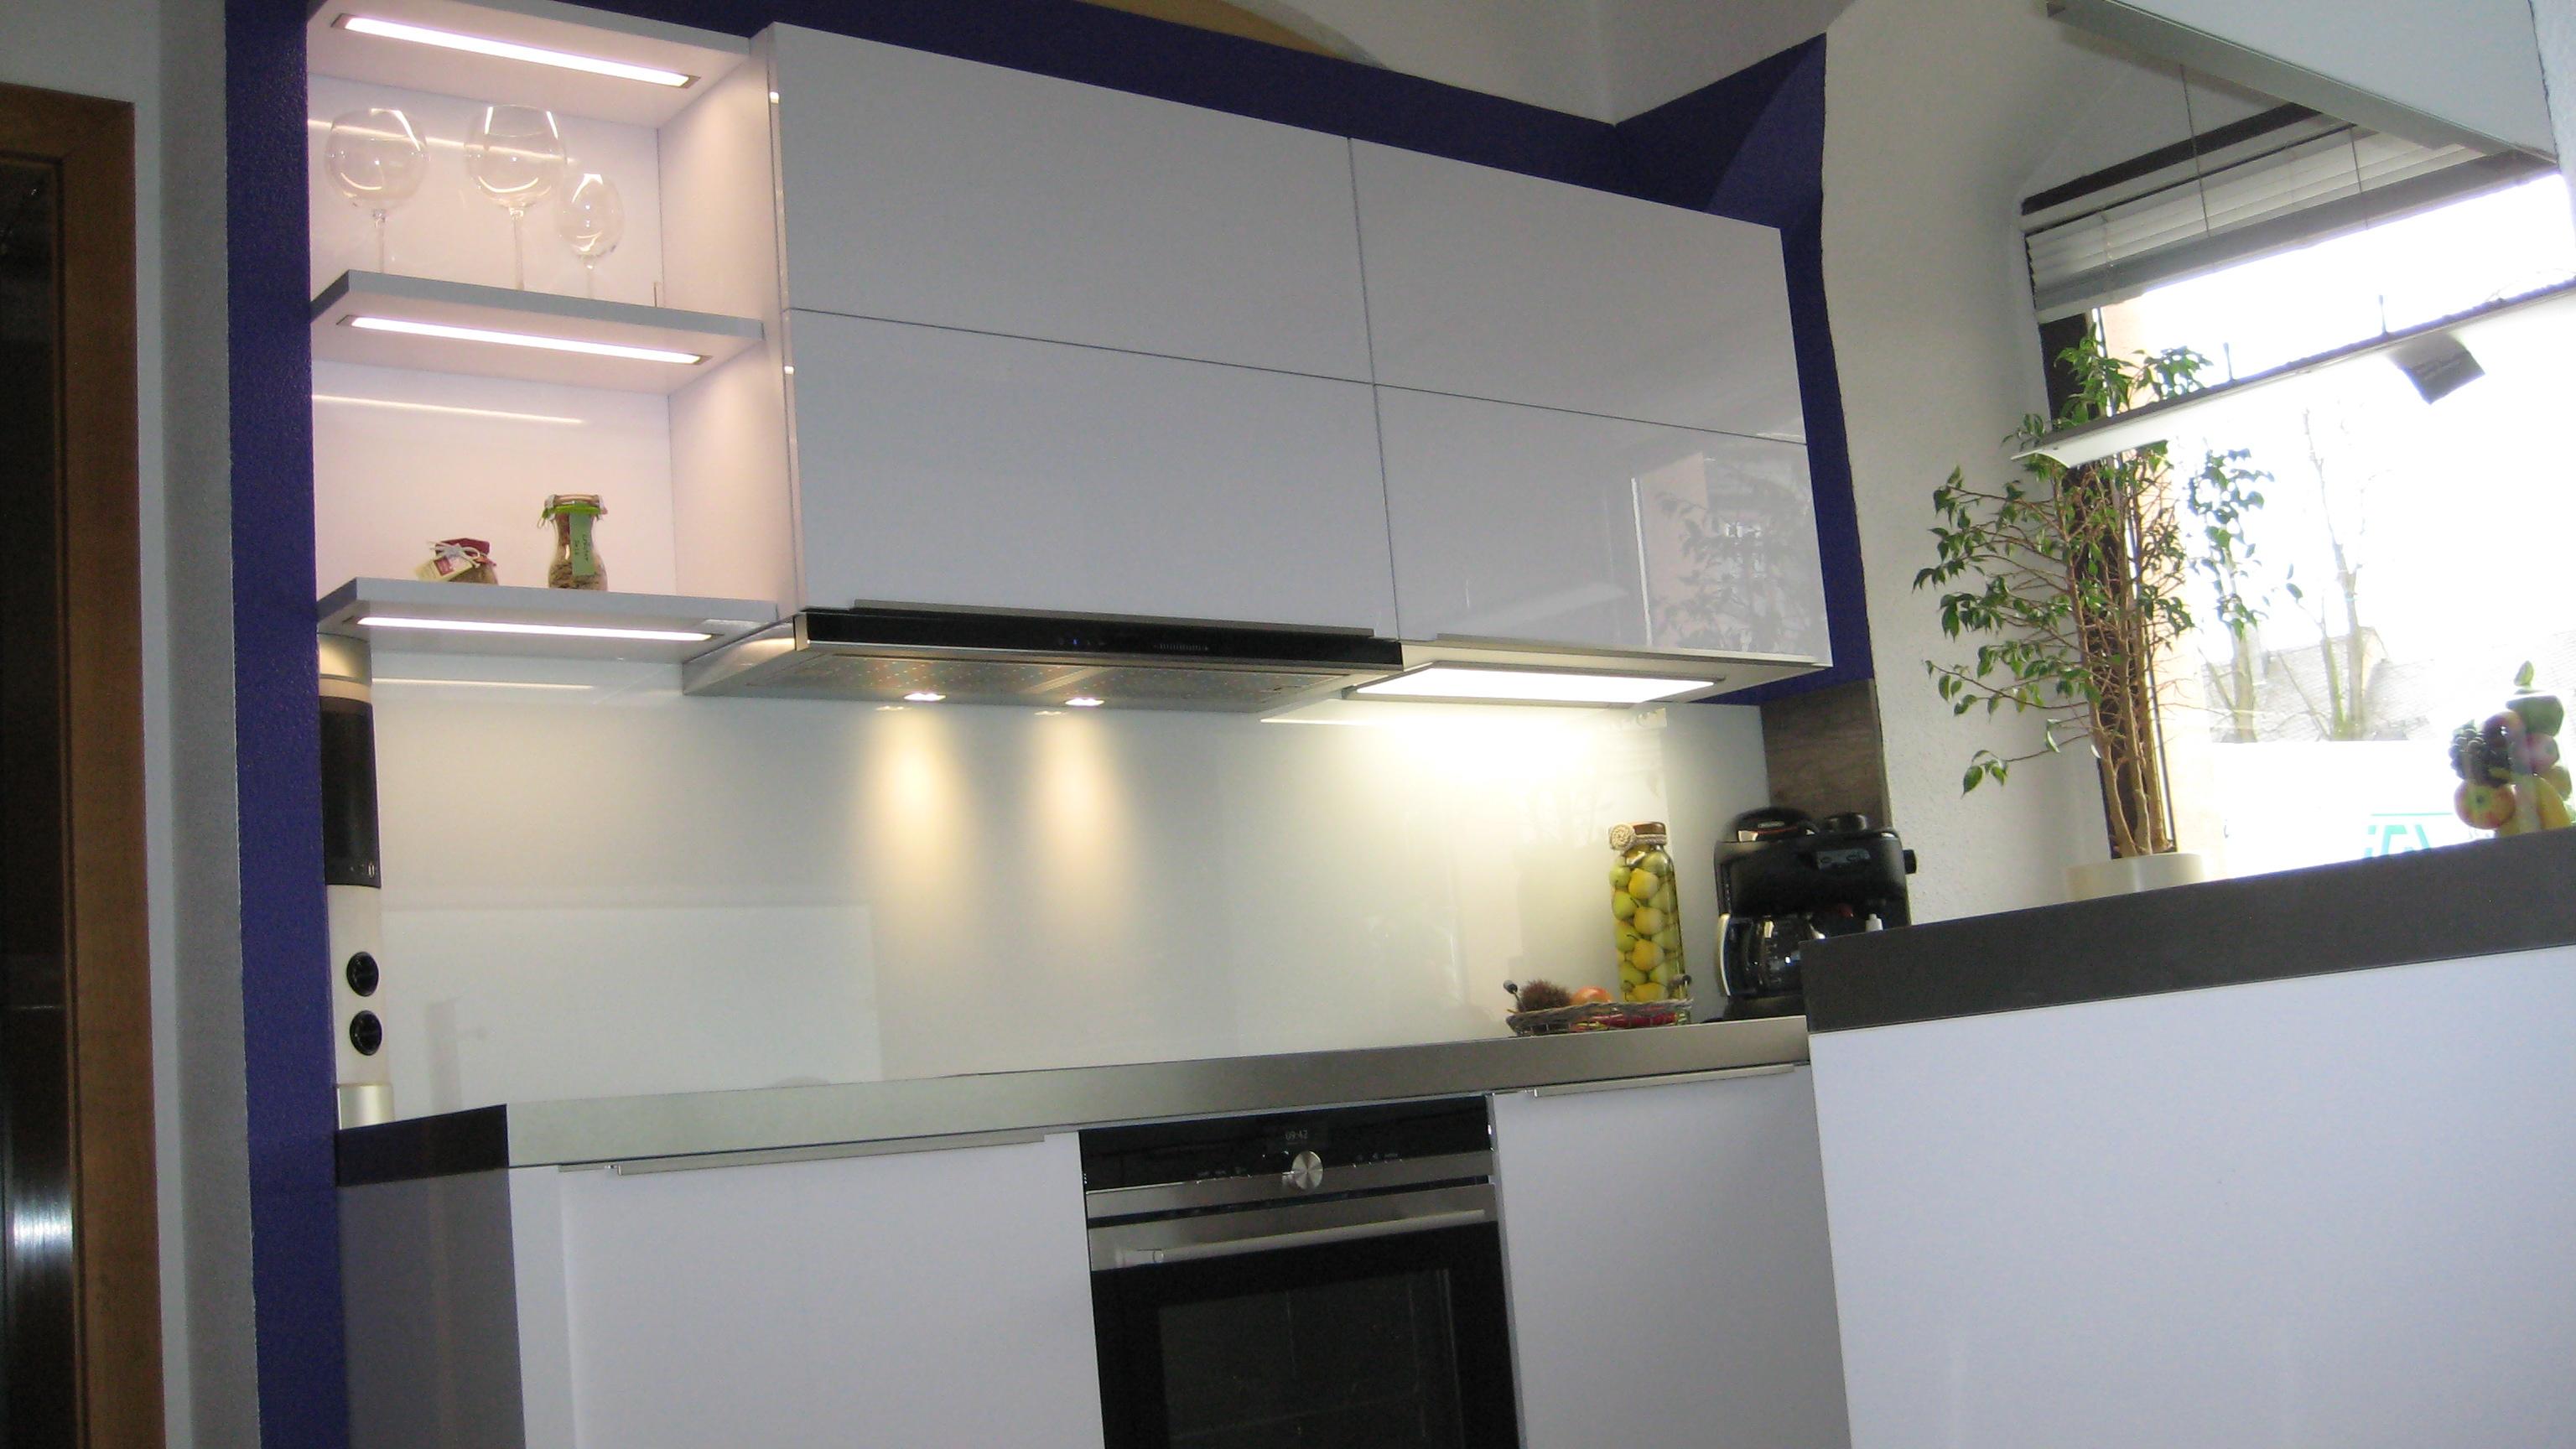 musterkchen abverkauf hannover finest abverkauf kuchen archive kuechen gunstigen amusant on. Black Bedroom Furniture Sets. Home Design Ideas